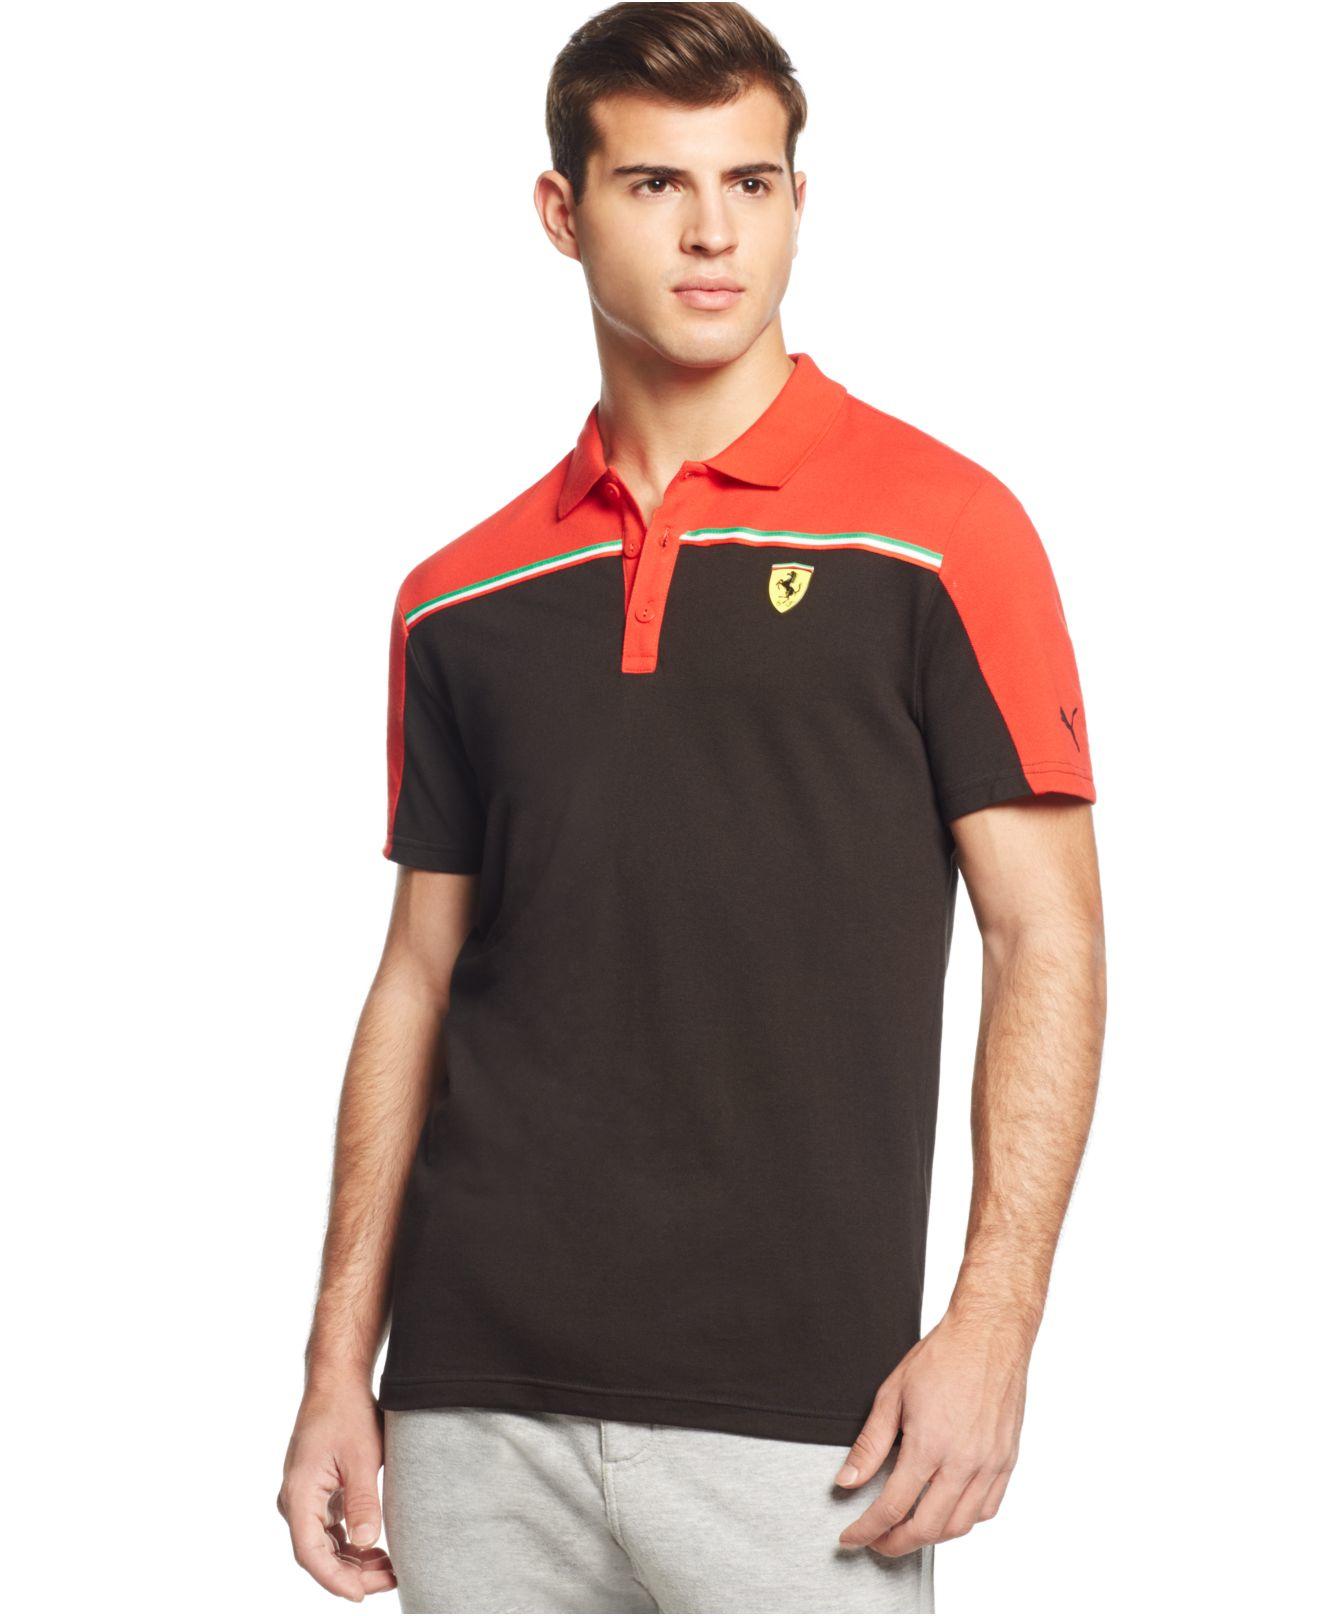 puma night moonless shoplifestyle polo ferrari products shirt mens